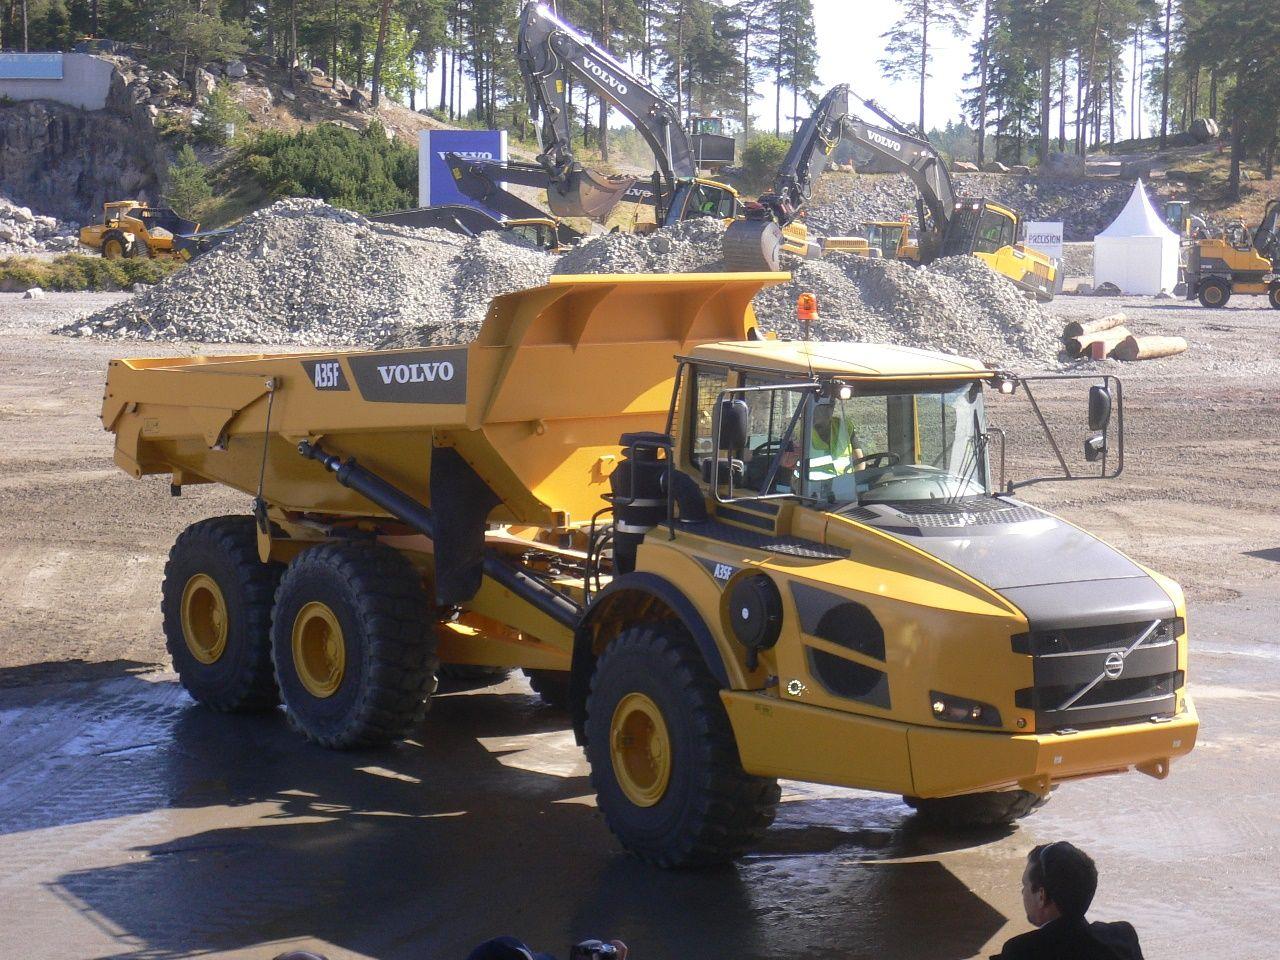 20 best volvo equiment images on pinterest | heavy equipment